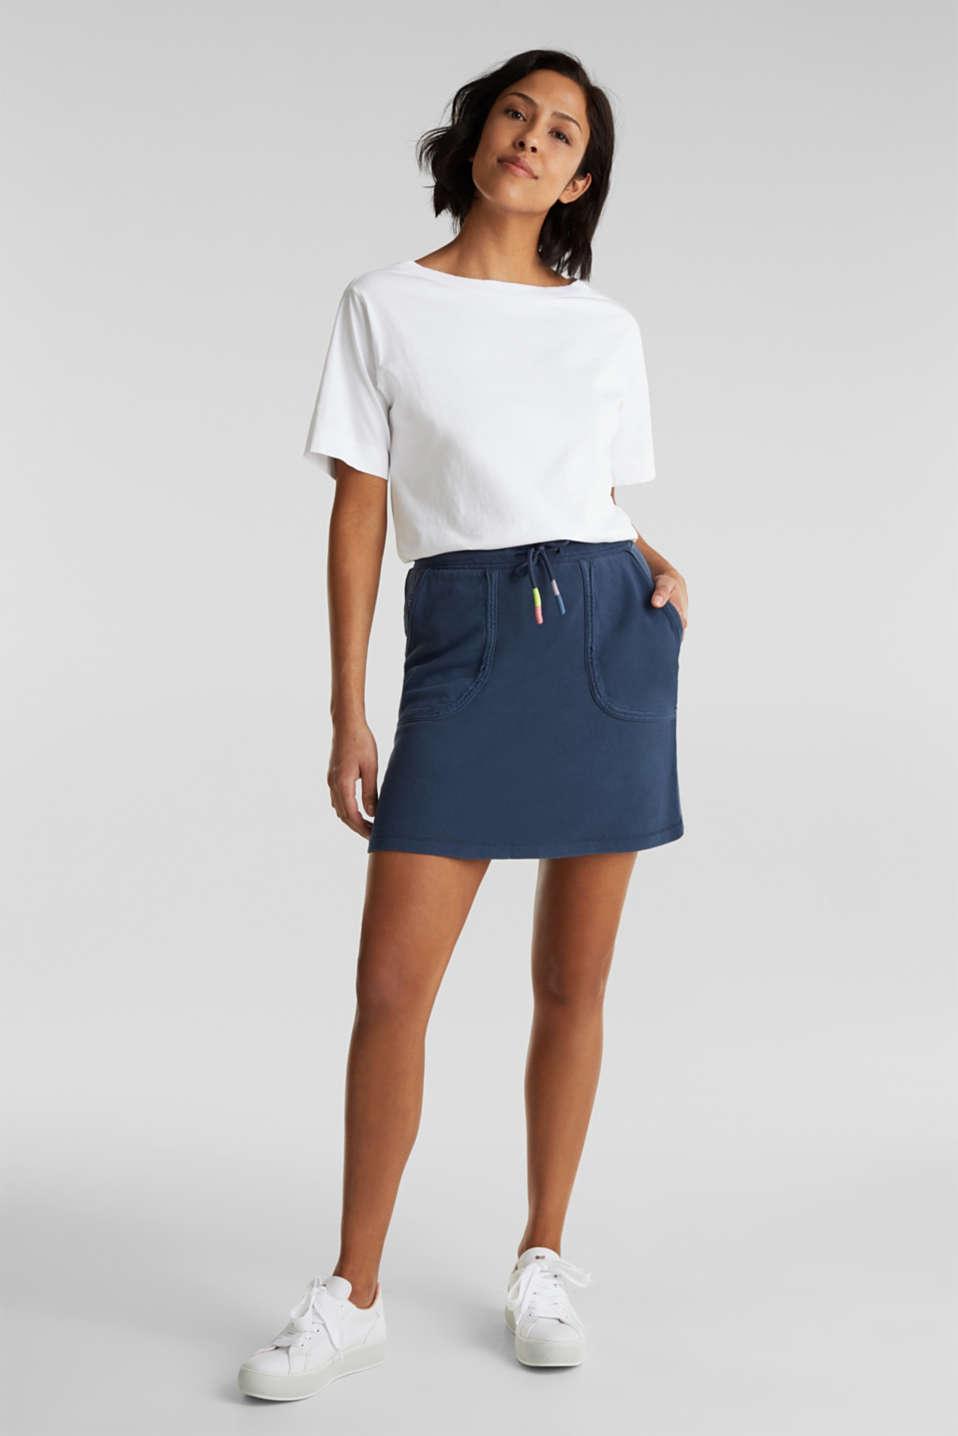 Sweatshirt fabric skirt made of cotton, NAVY, detail image number 1